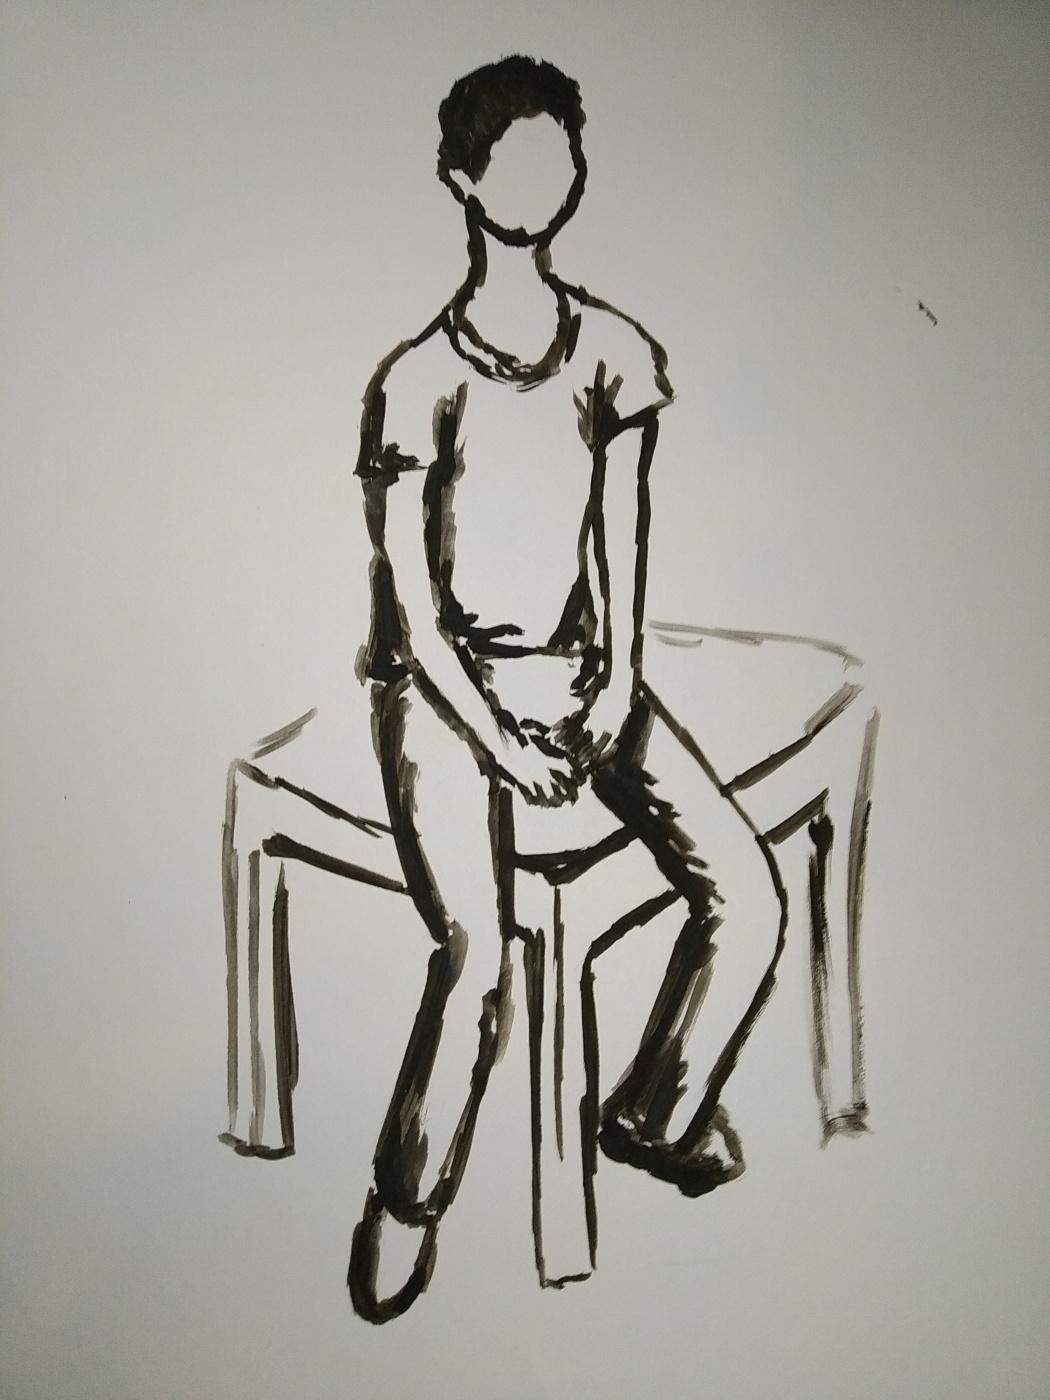 Zina Vladimirovna Parisva. Male portrait. Sketch